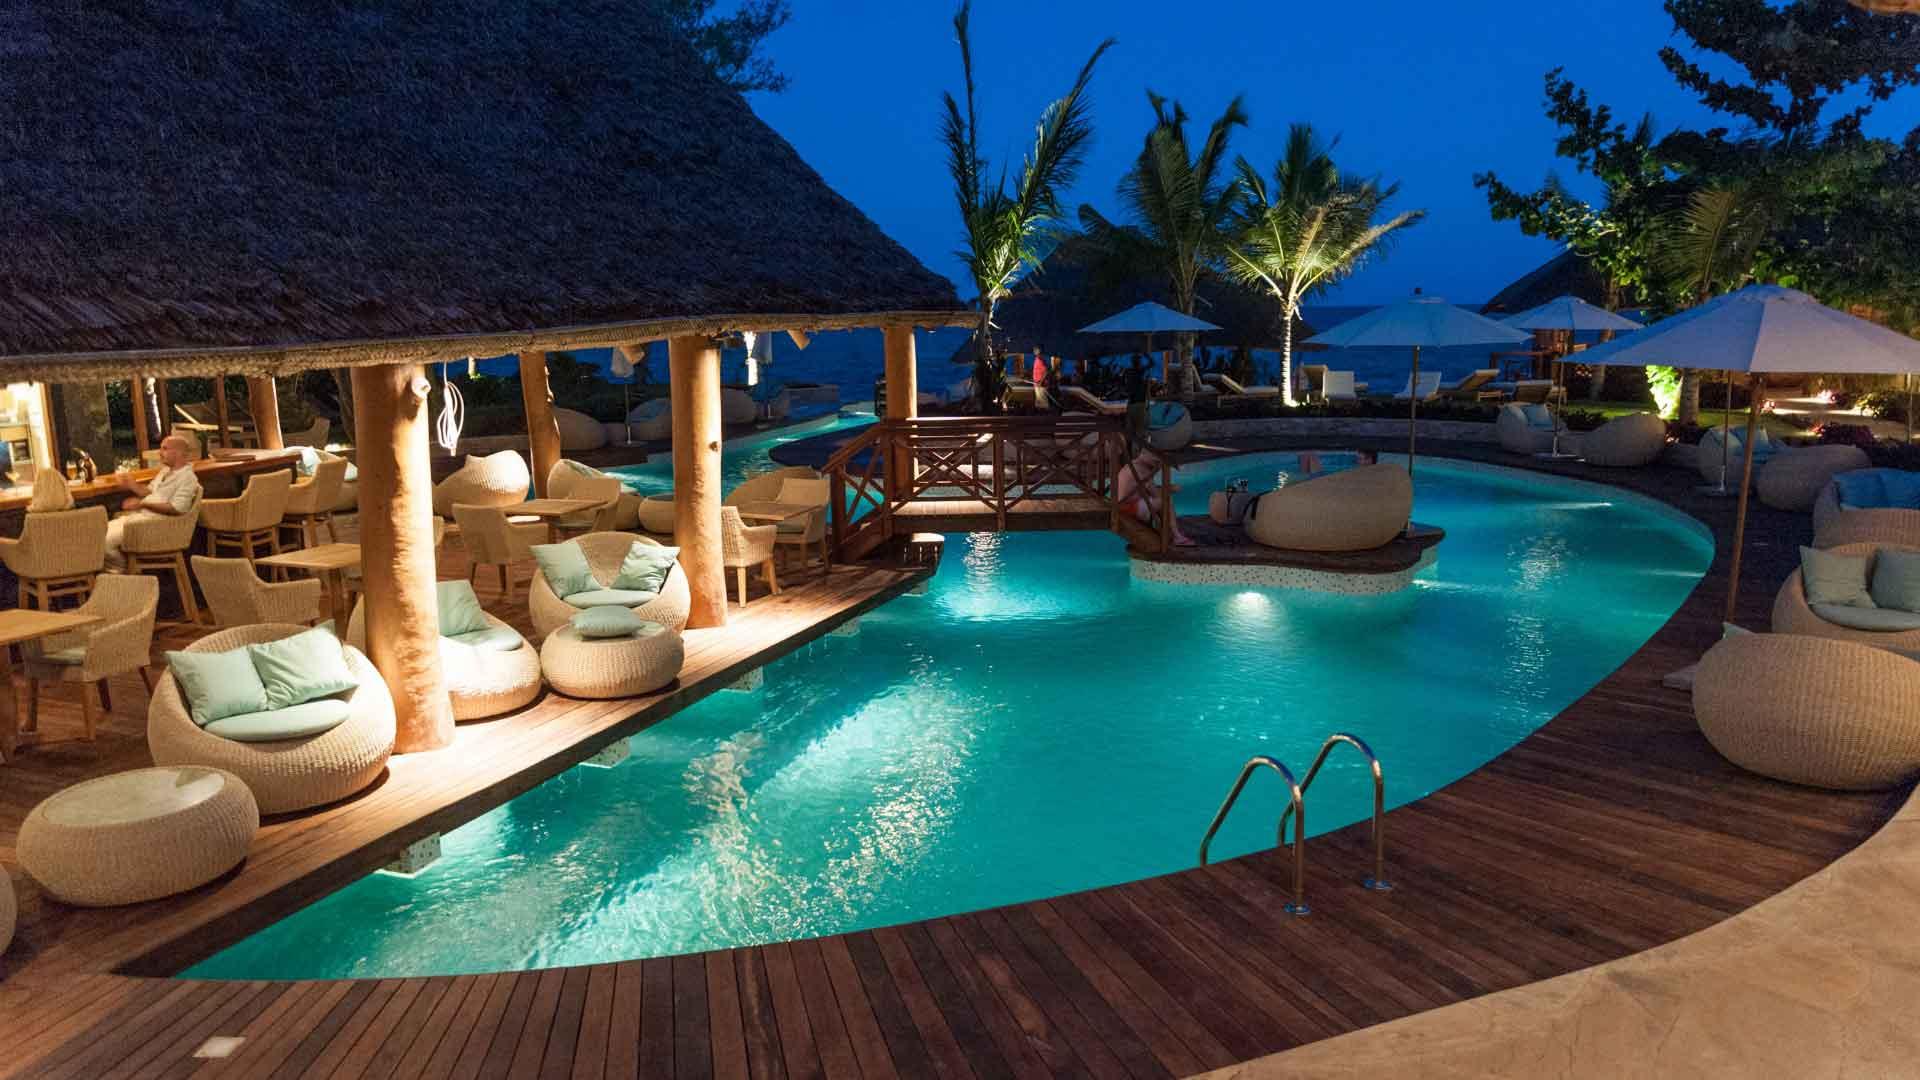 Tulia zanzibar packages unique safari and luxury resort for Hotel luxury zanzibar